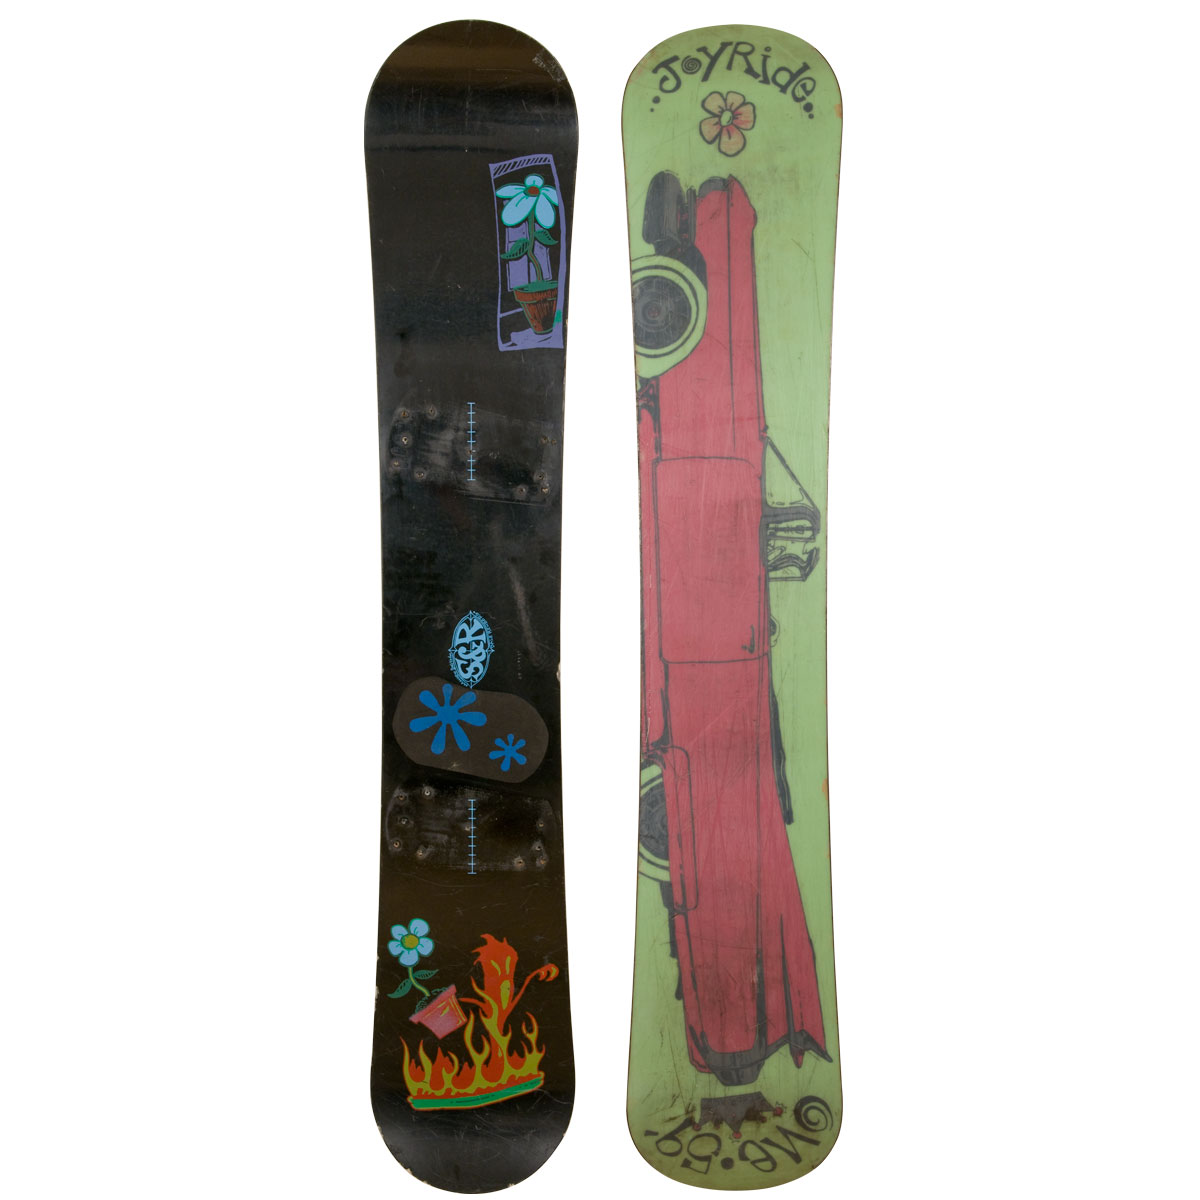 1992 Joyride Eldorado vintage snowboard